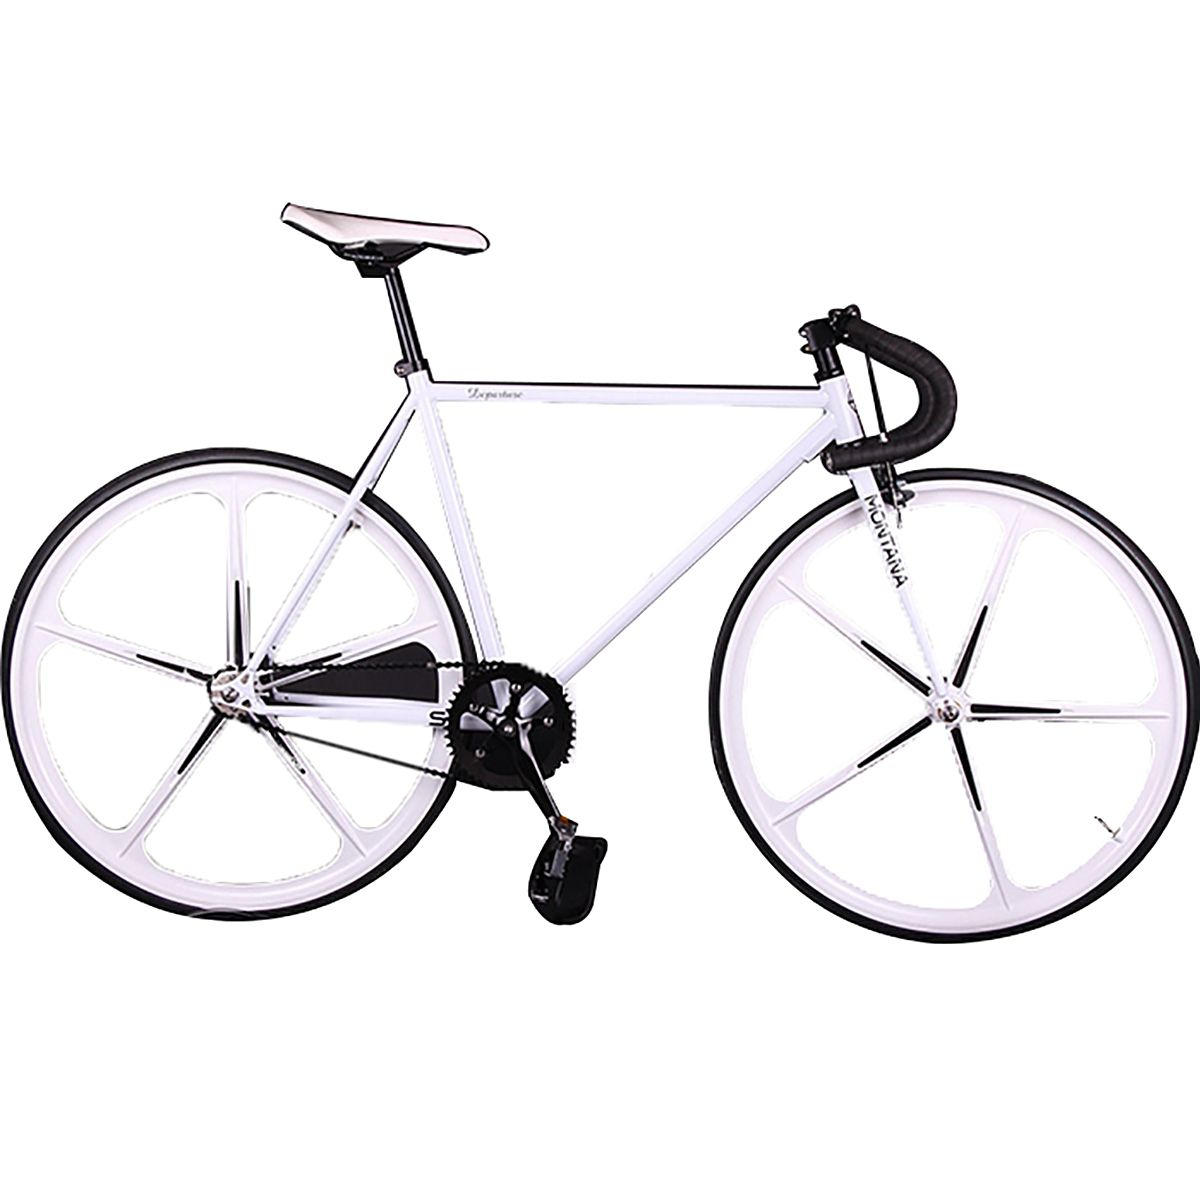 KOLUSSI TA119 700cc x 23cc Bicicletas de engranaje fijo de freno ...